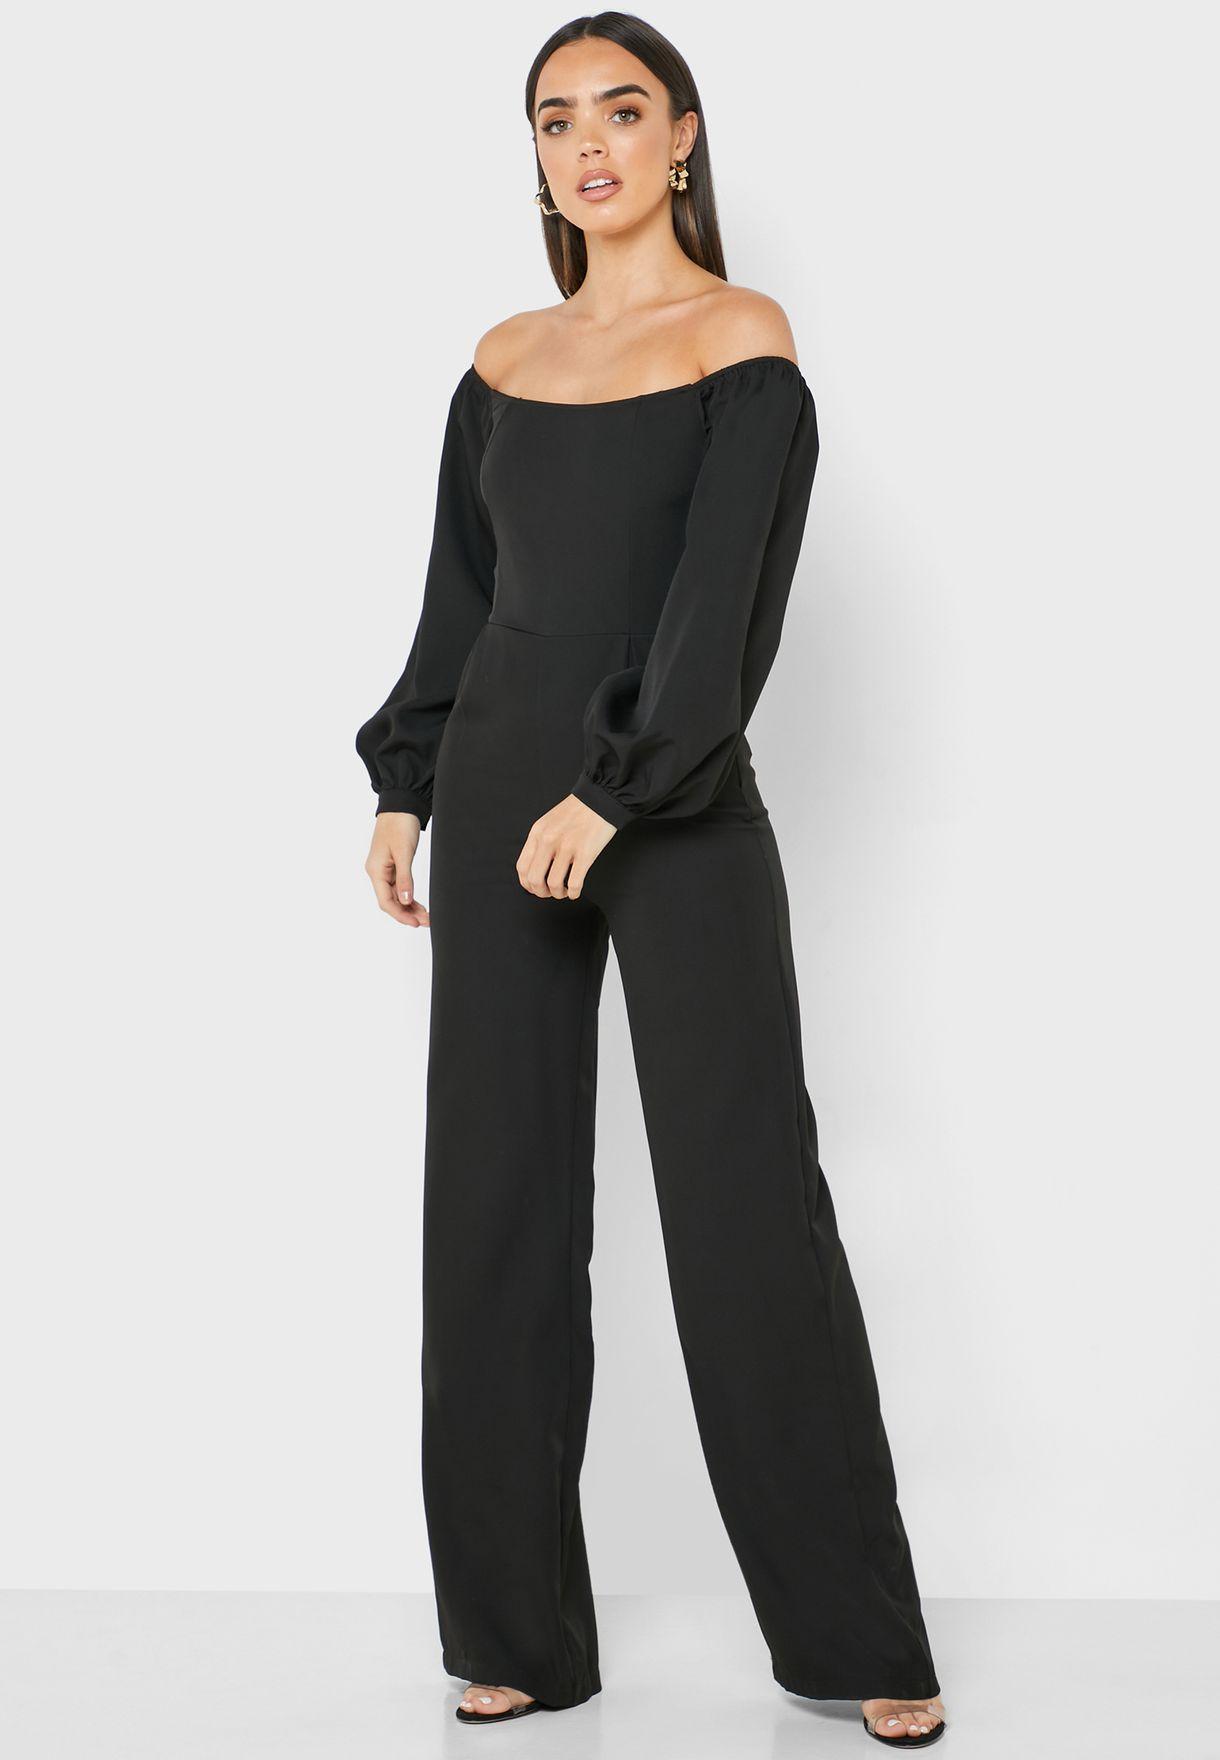 Bardot Lace Up Back Jumpsuit